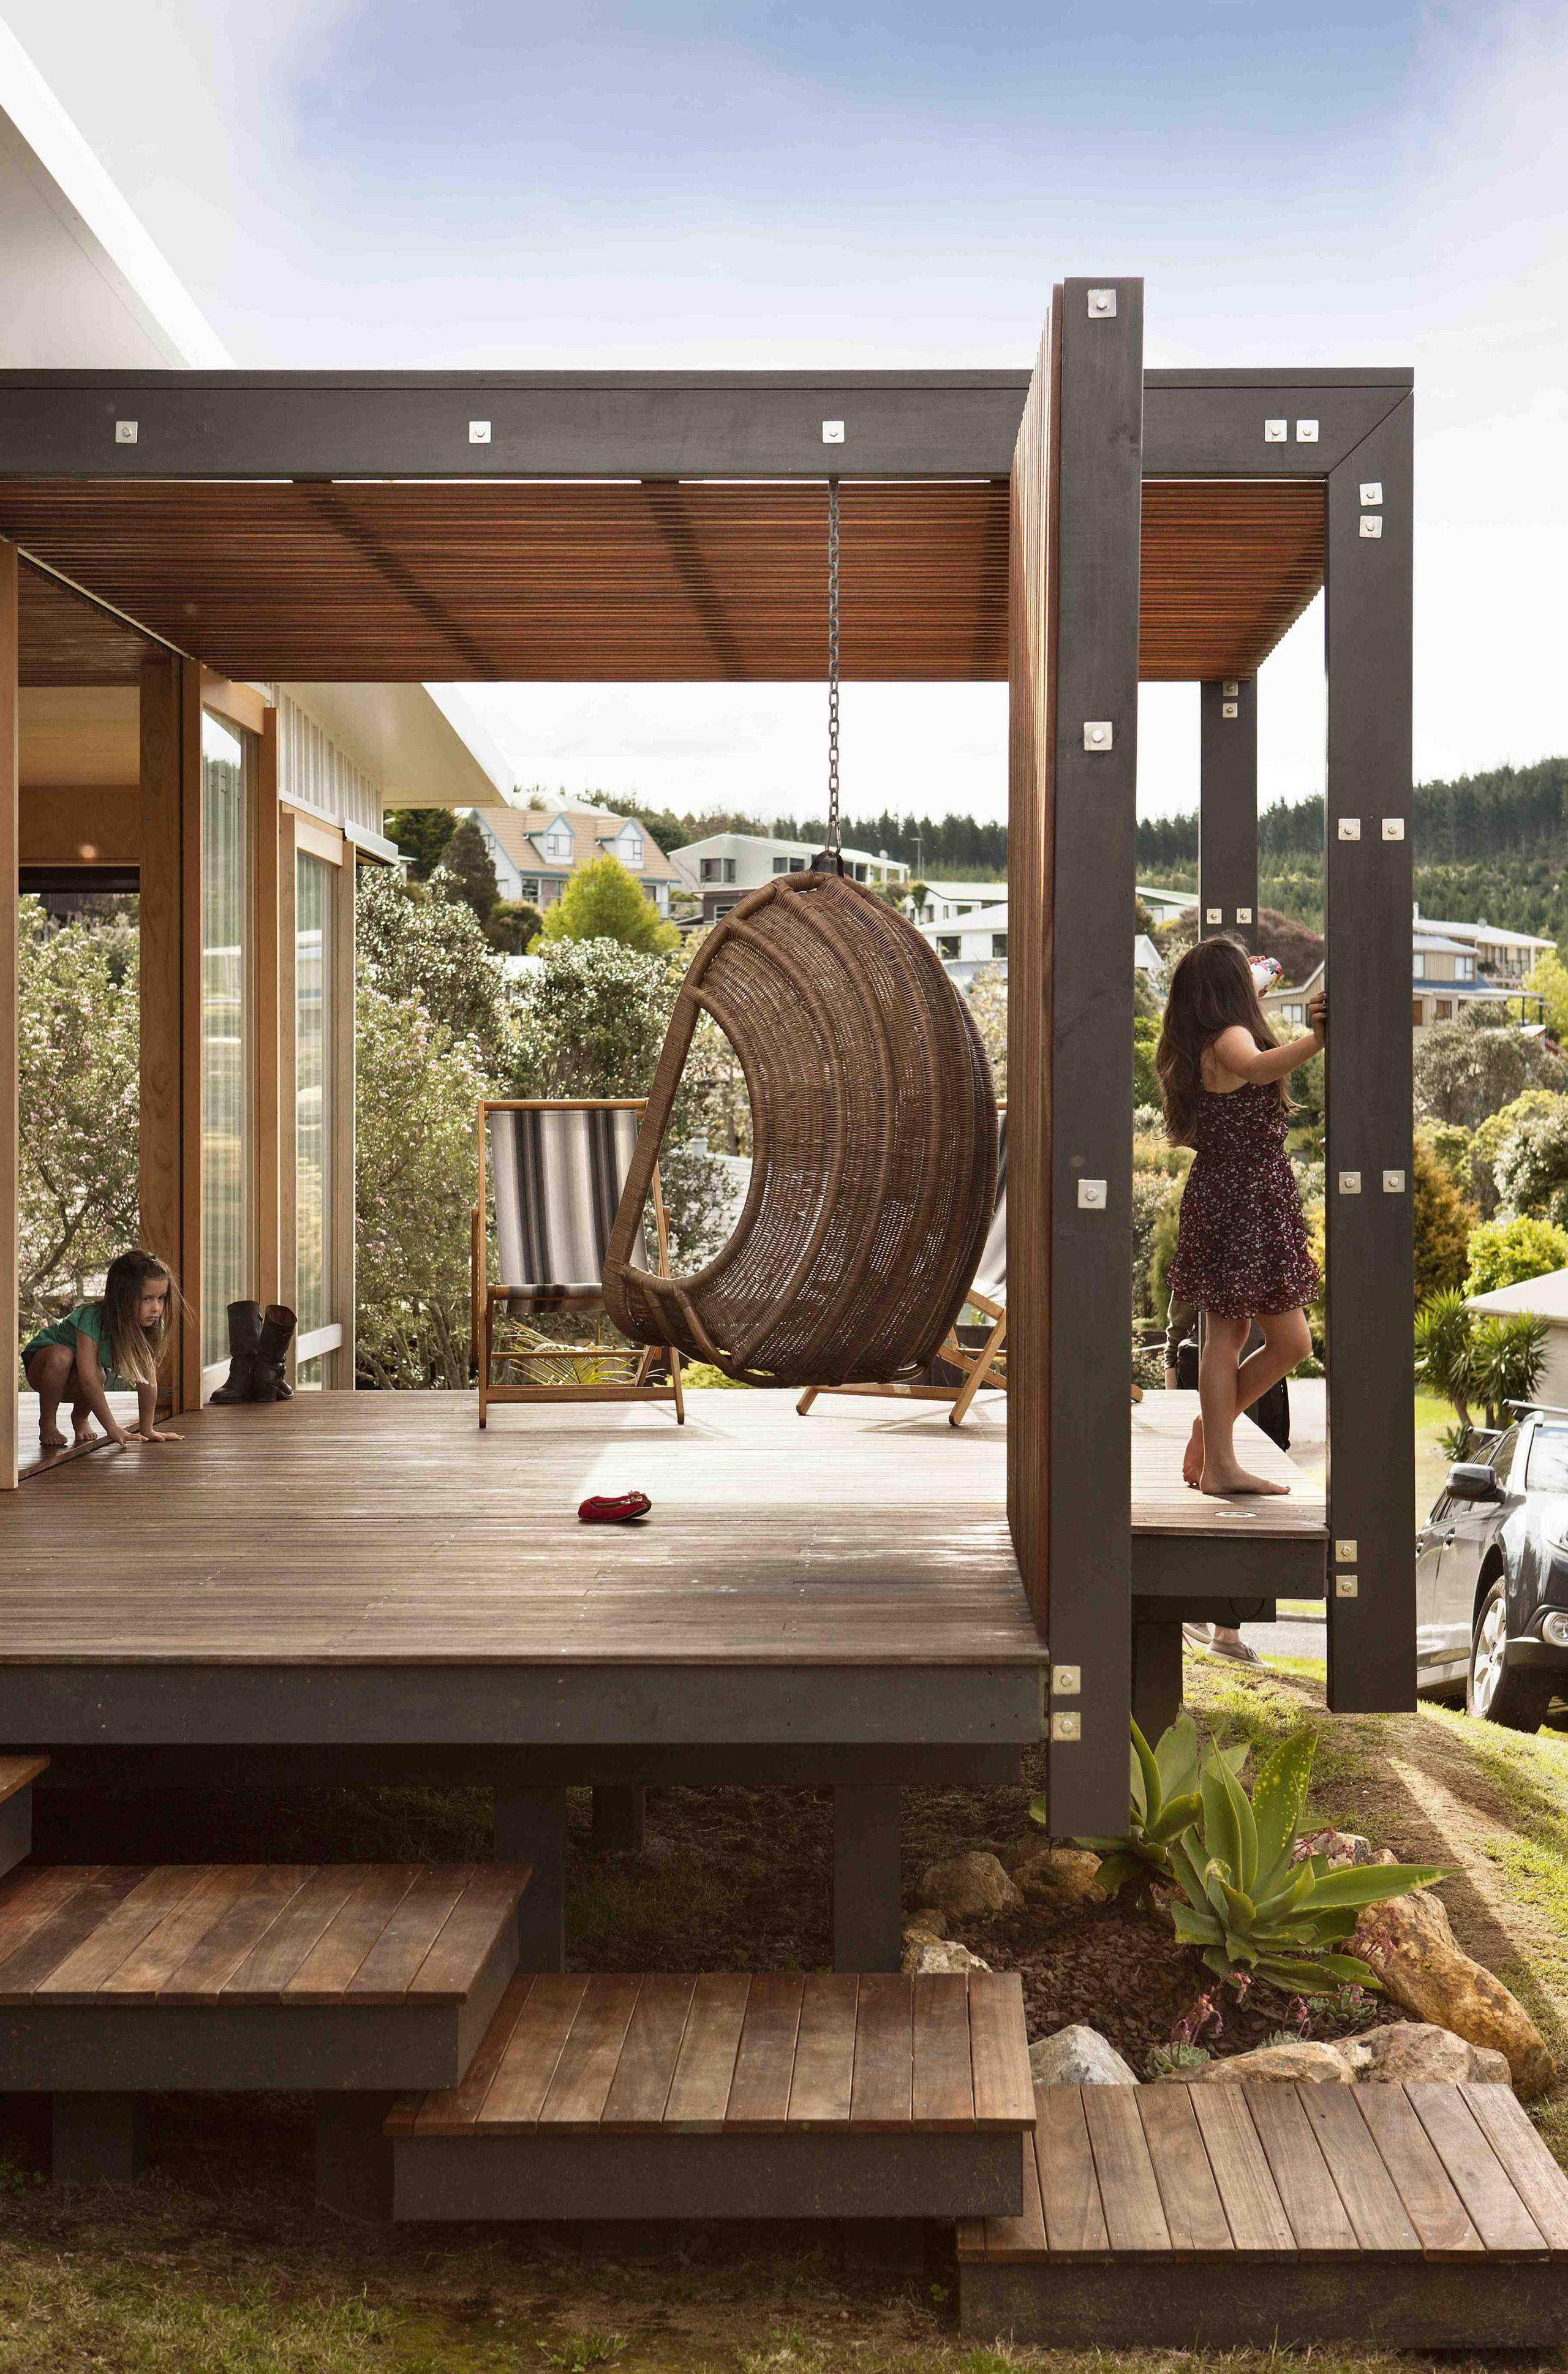 Coromandel, New Zealand - Studio 19 Onemana Bach backyard, outdoor structure, brown, white